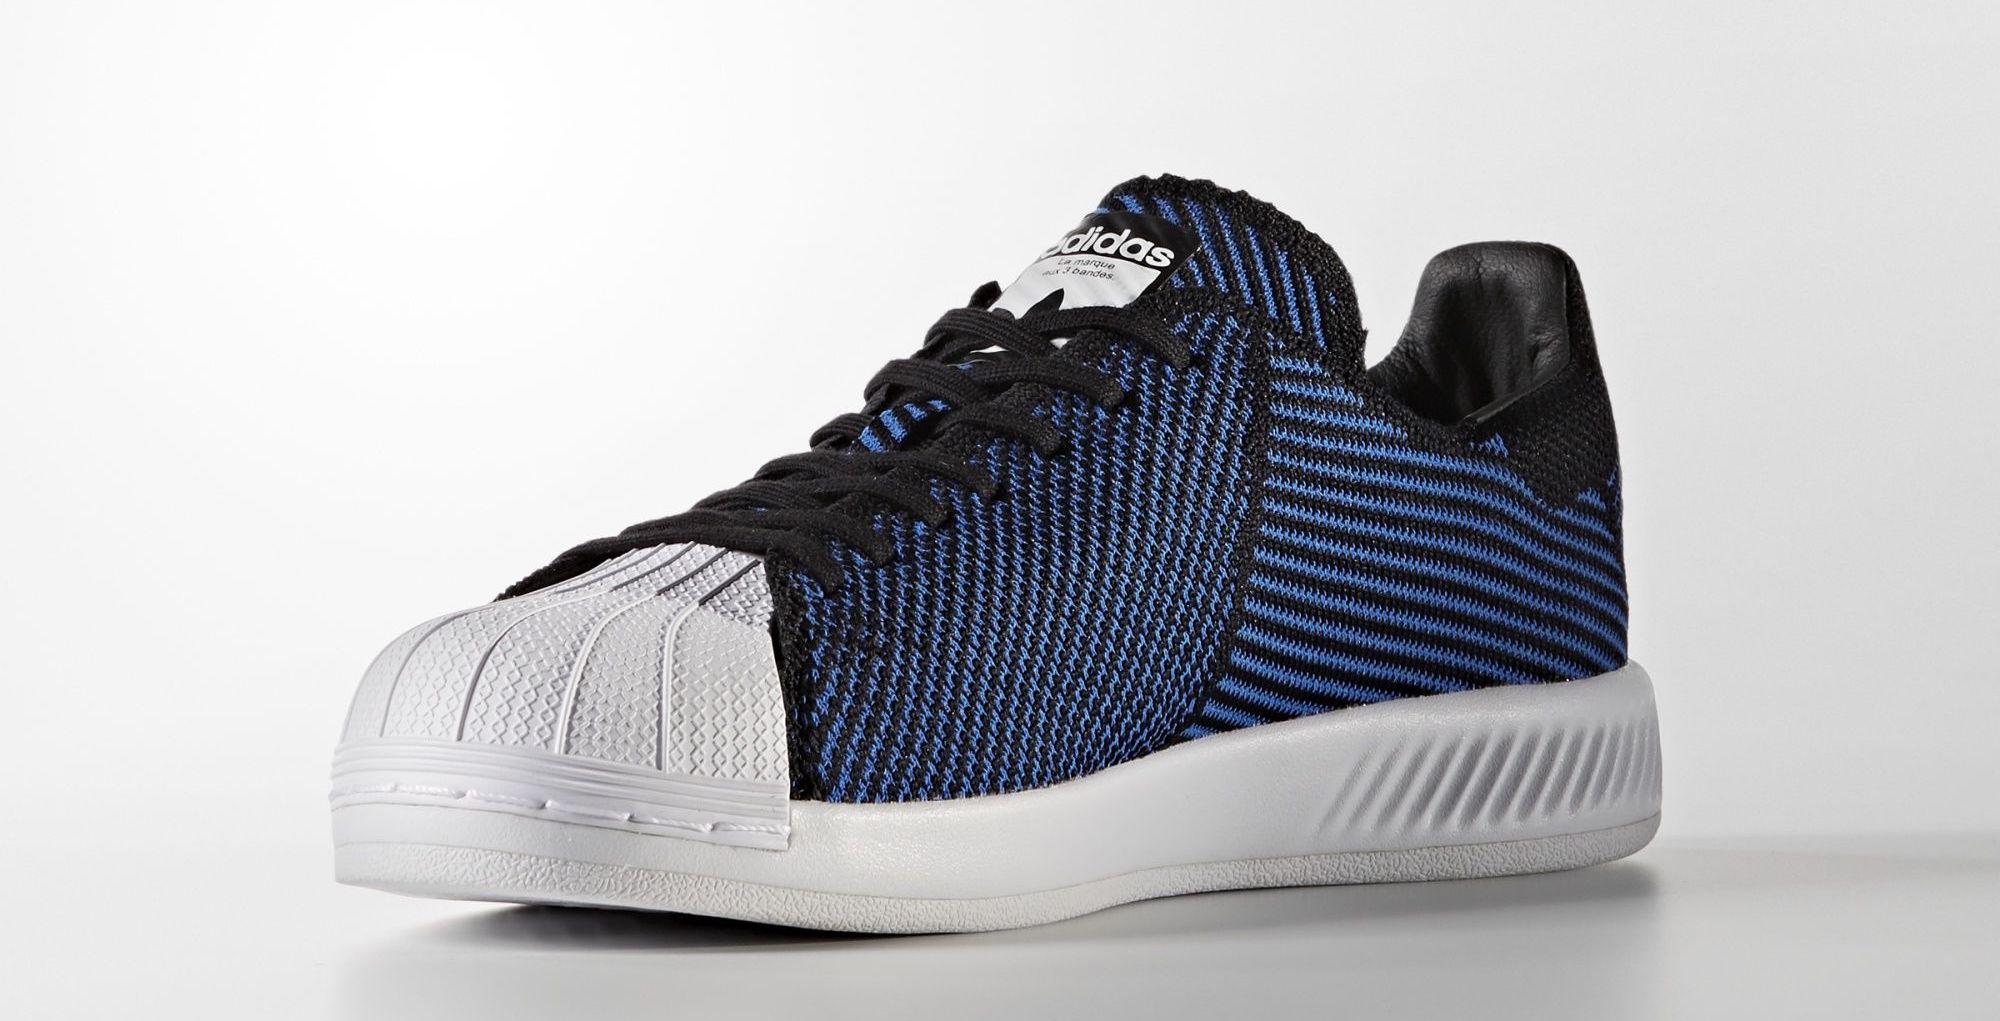 comprare adidas superstar primeknit donne blu > off64%)